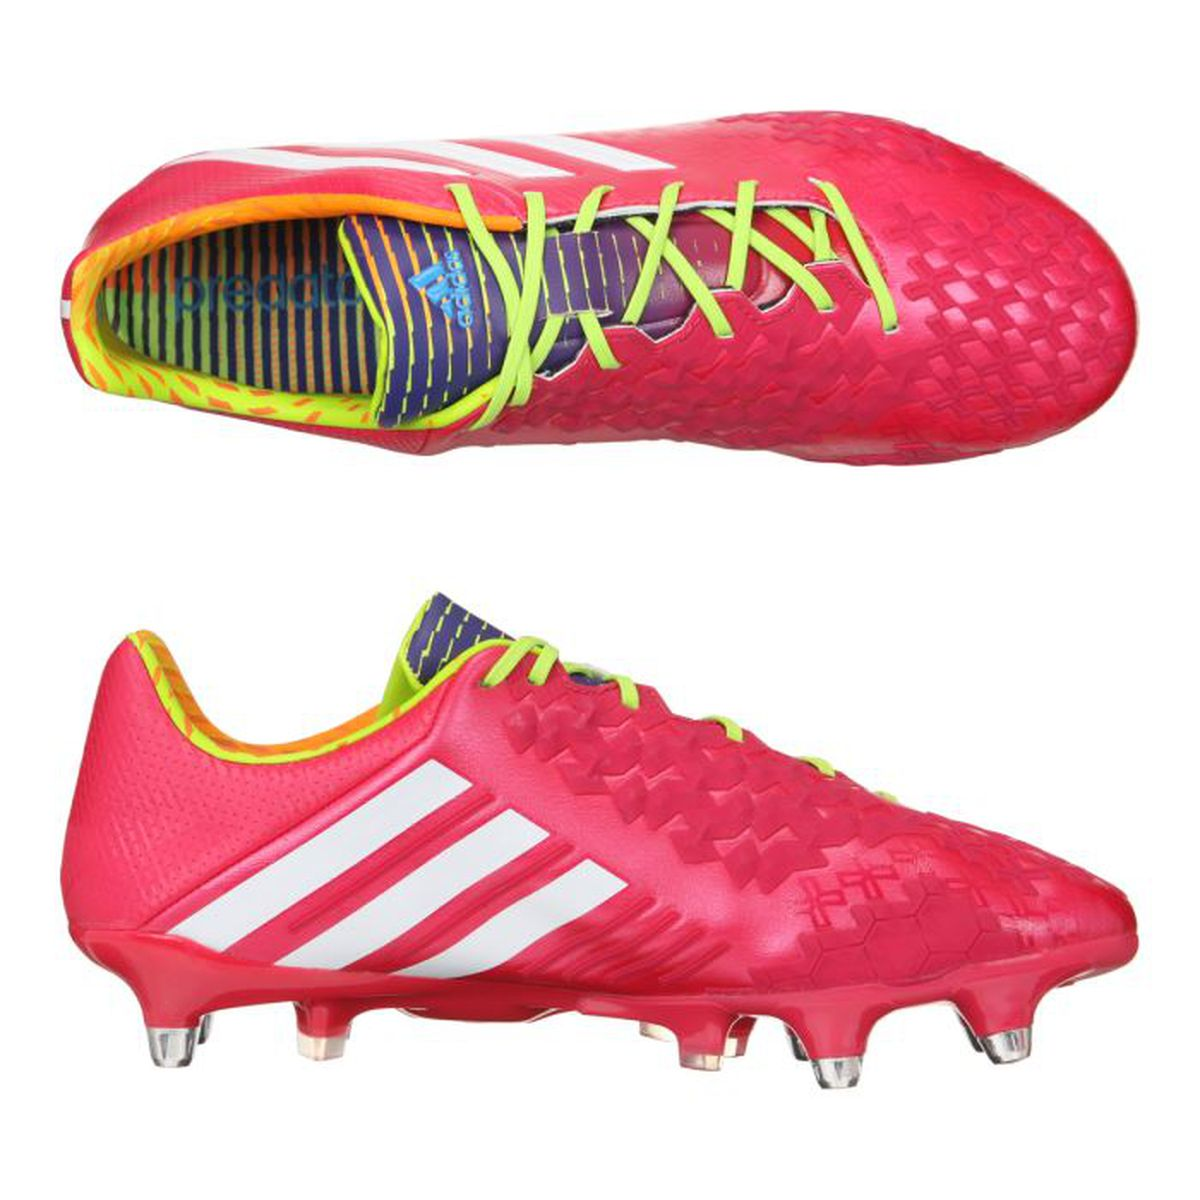 adidas chaussures de foot predator lz xtrx sg